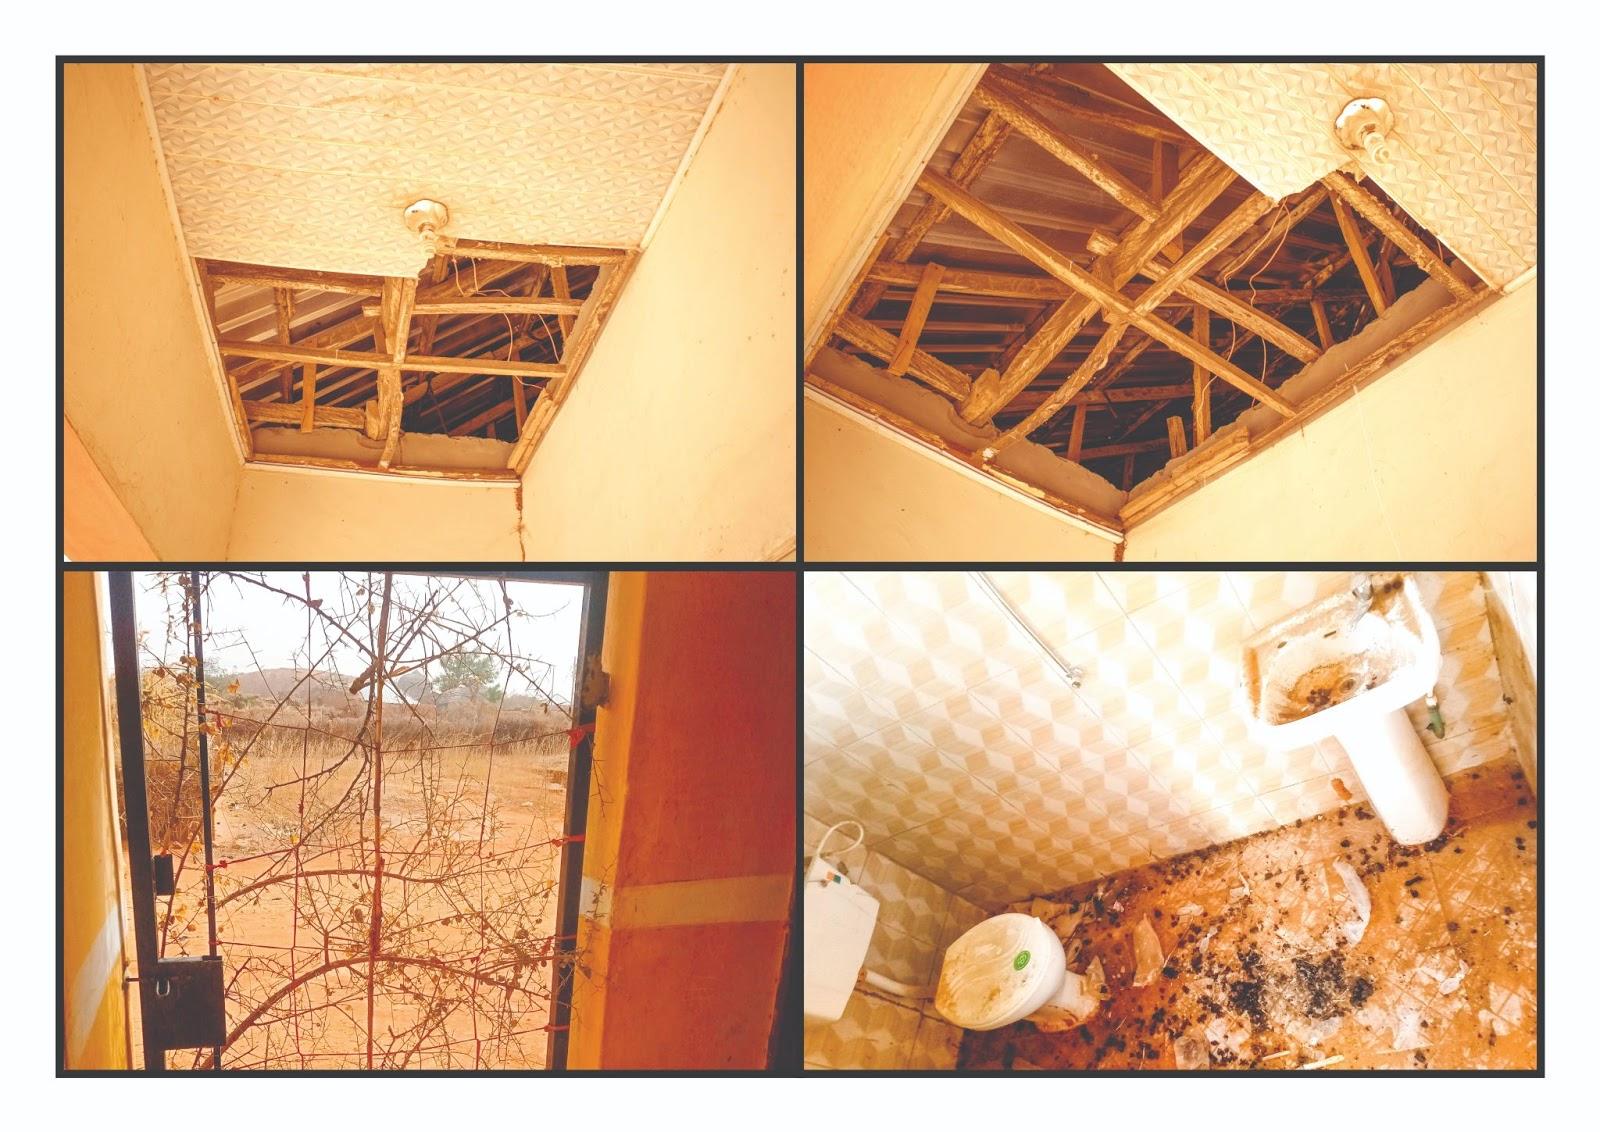 Abandoned Primary Health Centre at Kalanjeni, Tangaza LGA, Sokoto State. Photo Credit: Qosim Suleiman